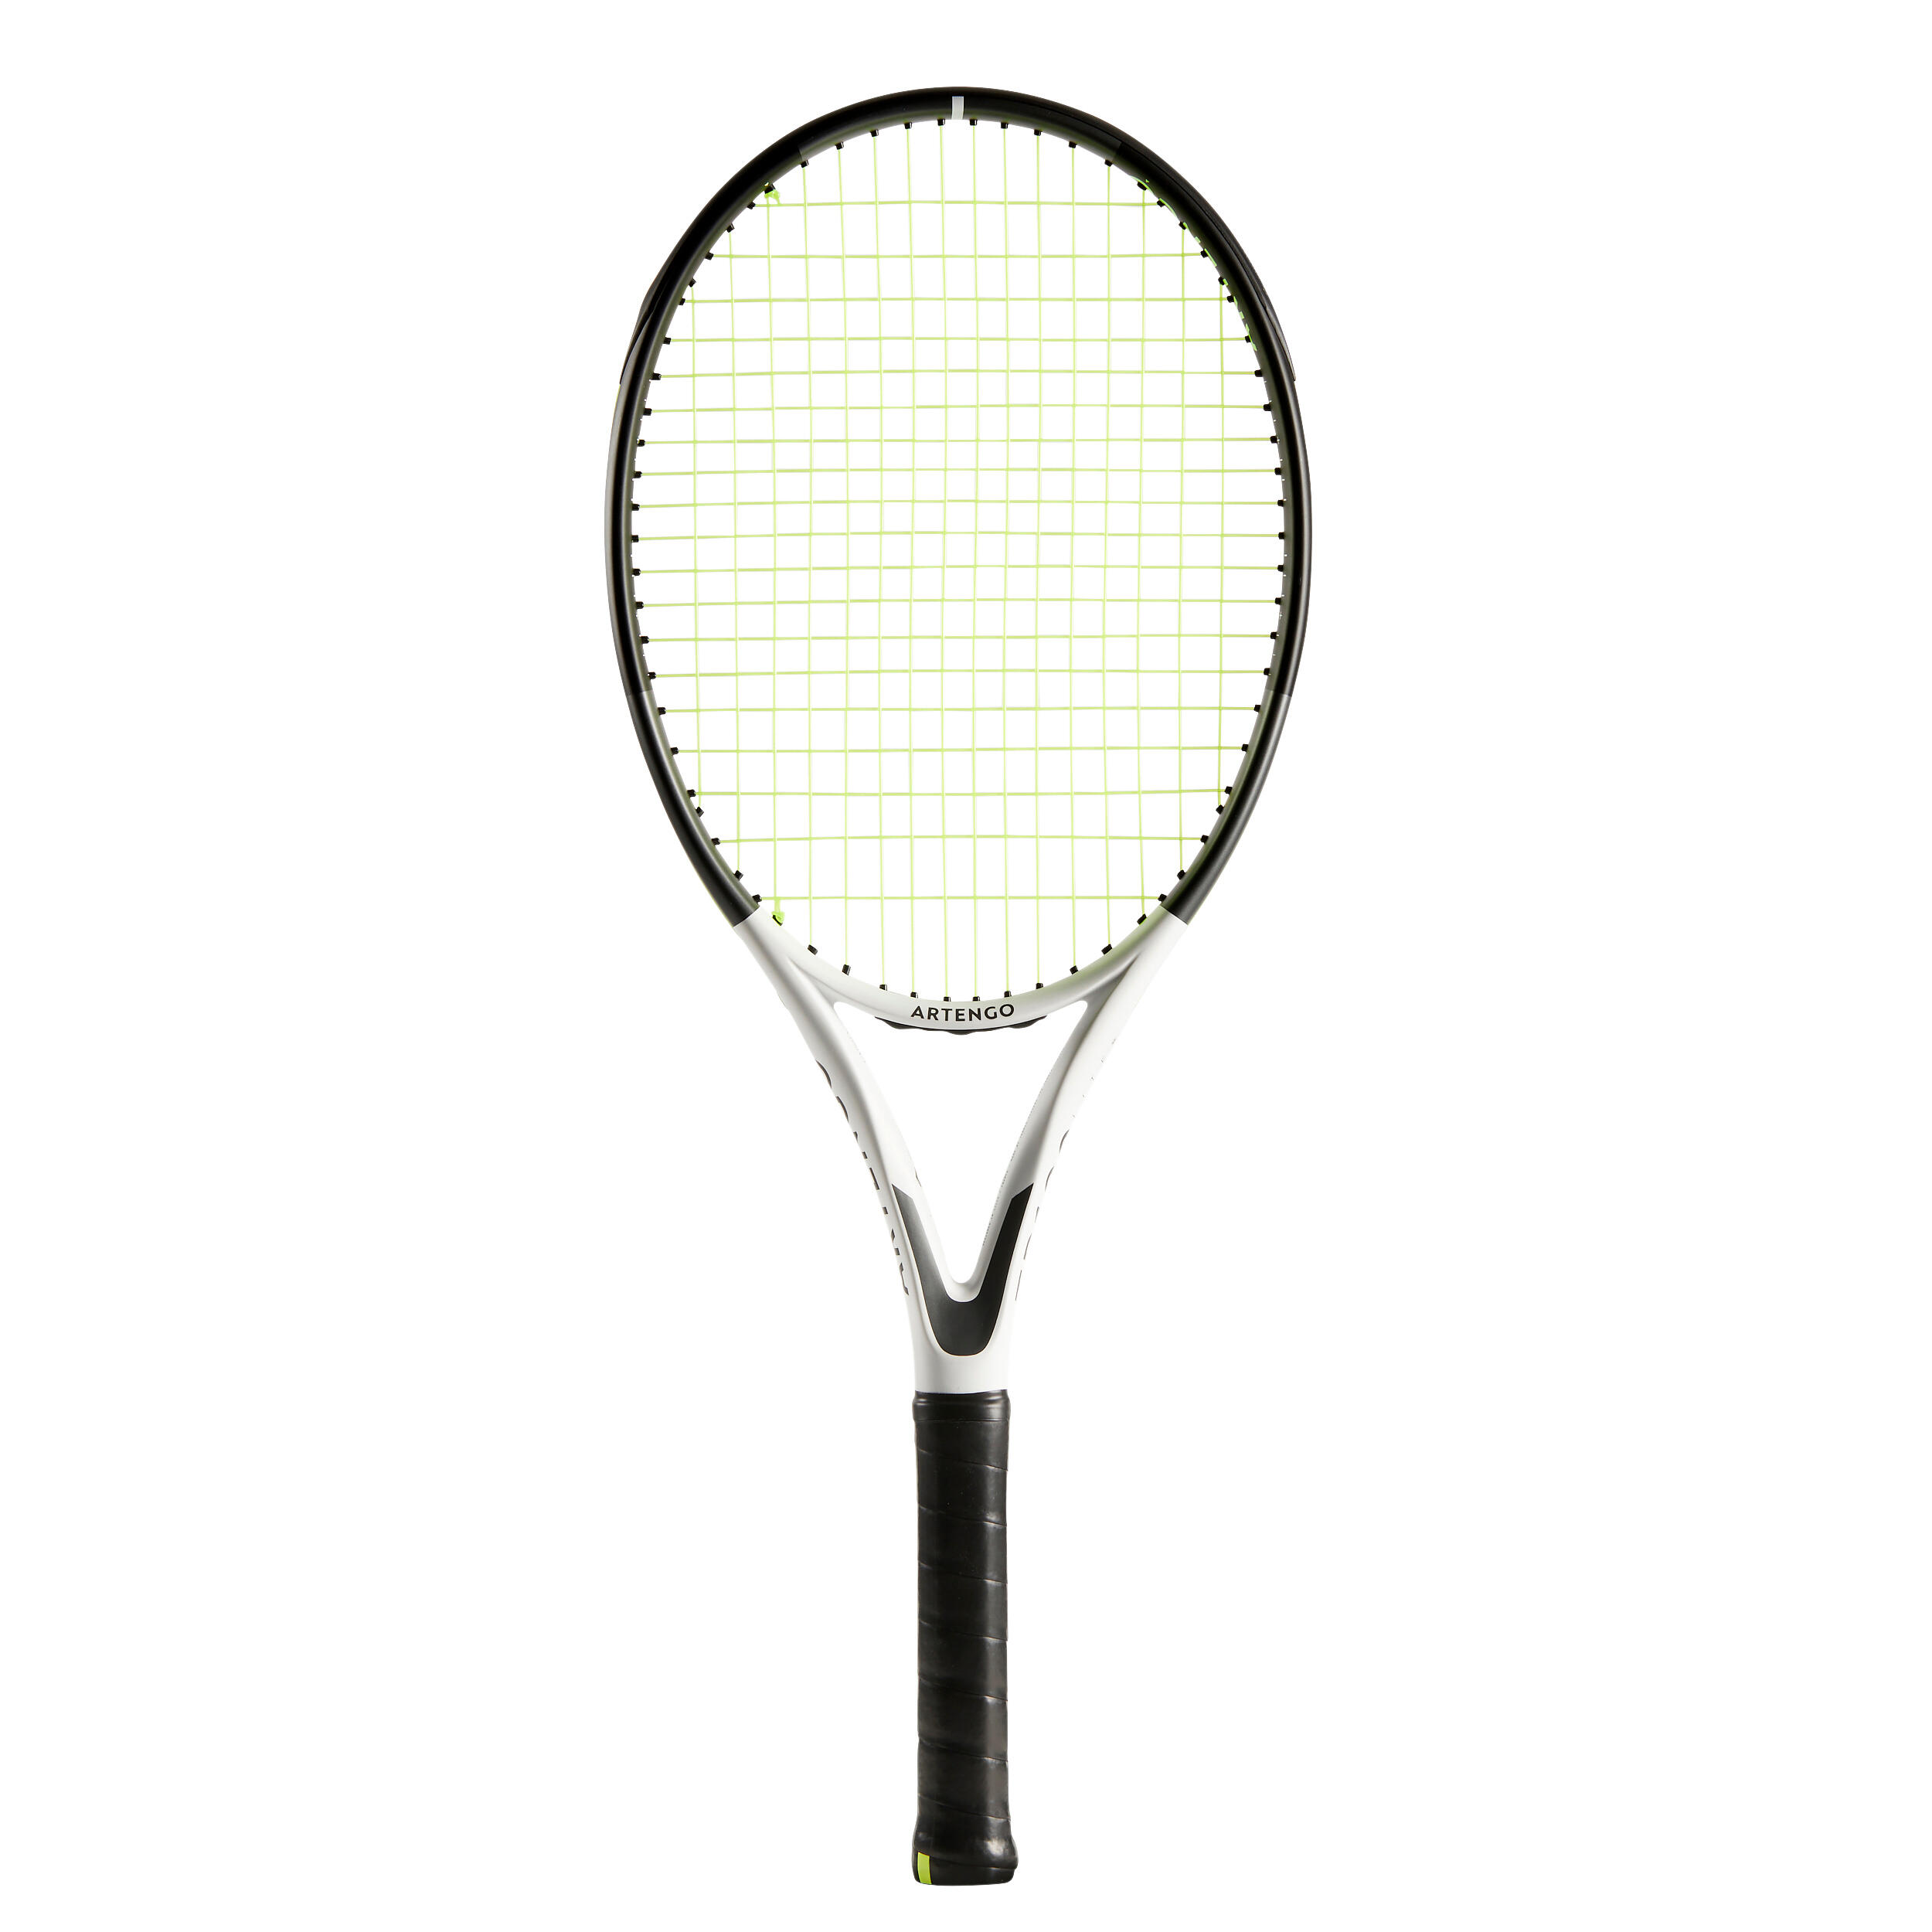 Rachetă Tenis TR190 LITE V2 imagine